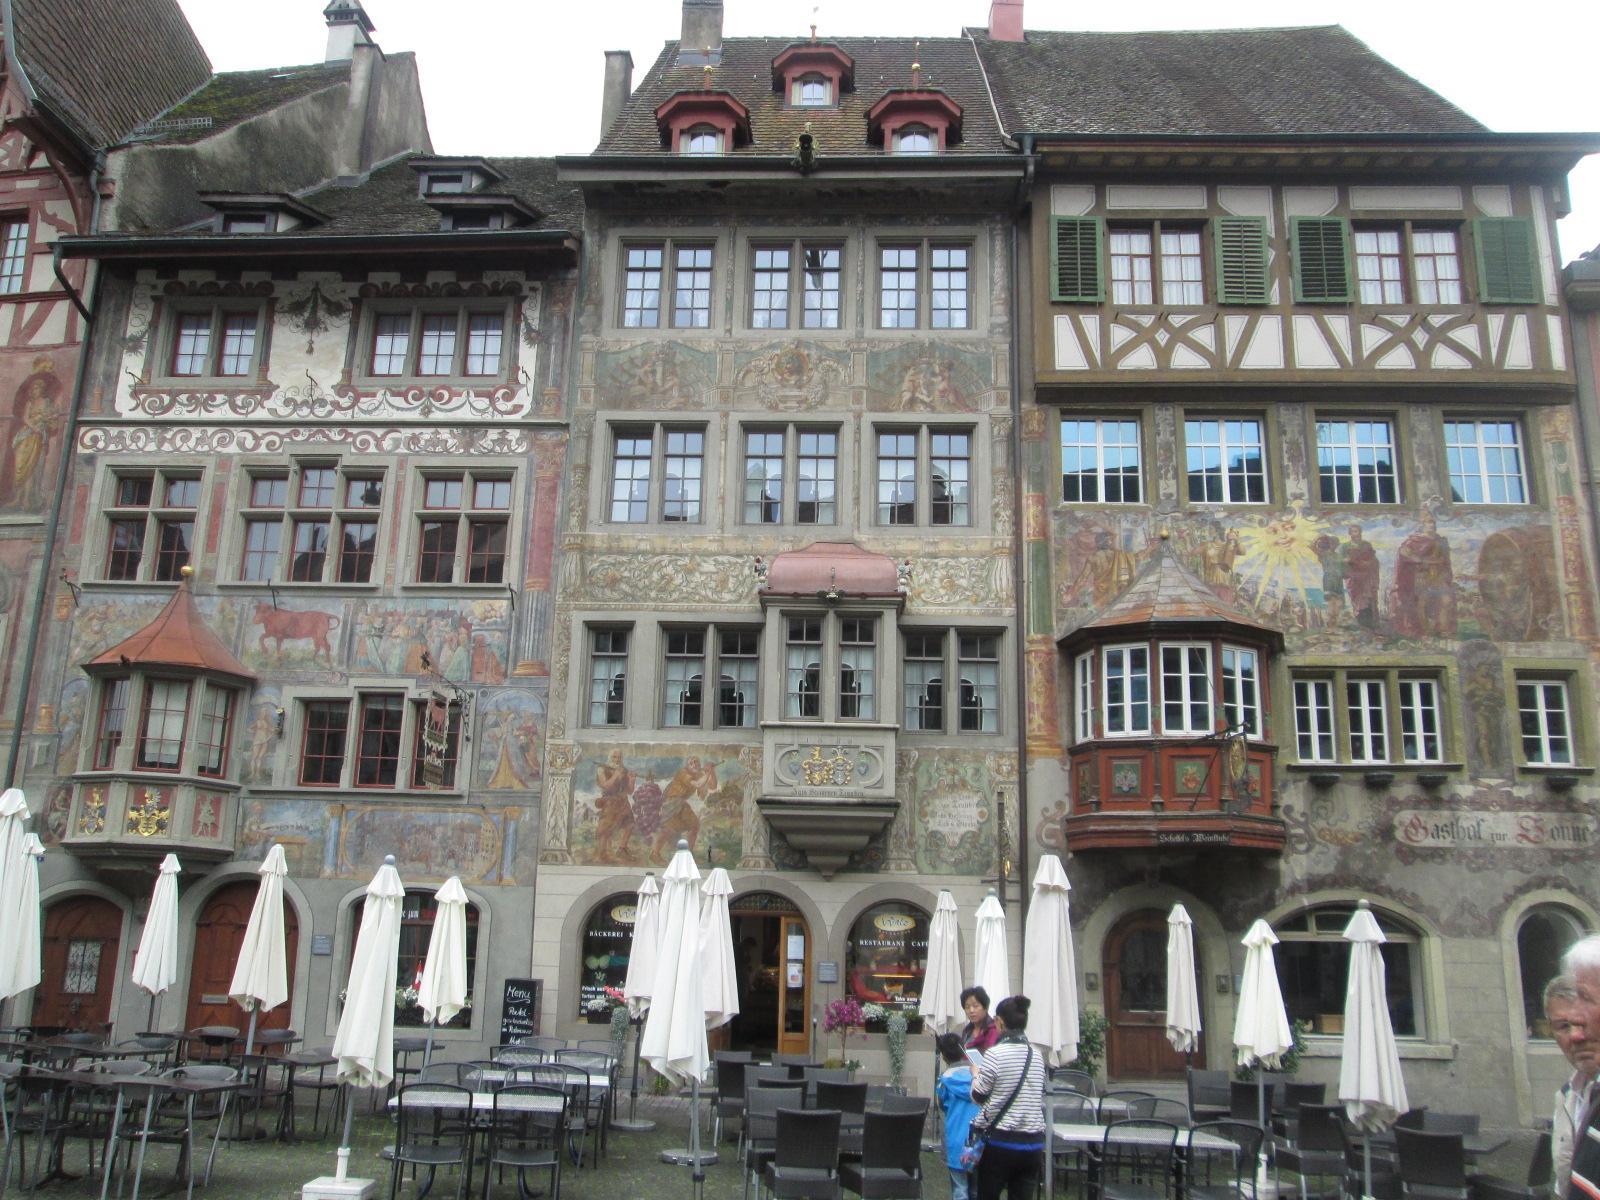 la bella piazza di Stein an Rhein